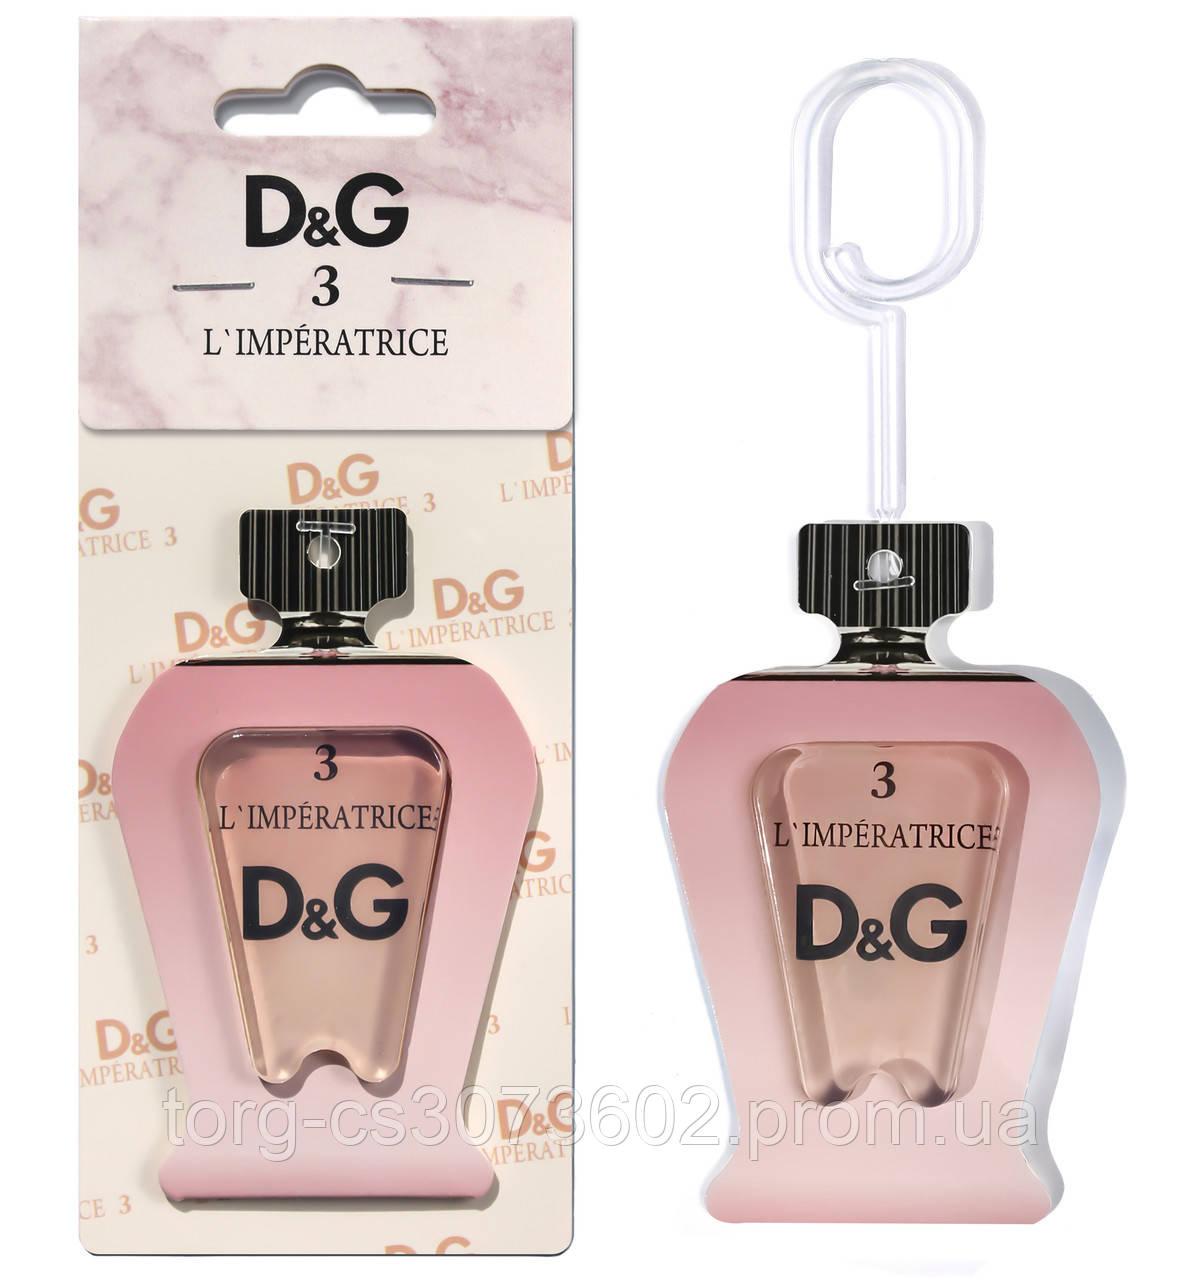 Ароматизатор в машину Dolce&Gabbana 3 L`Imperatrice